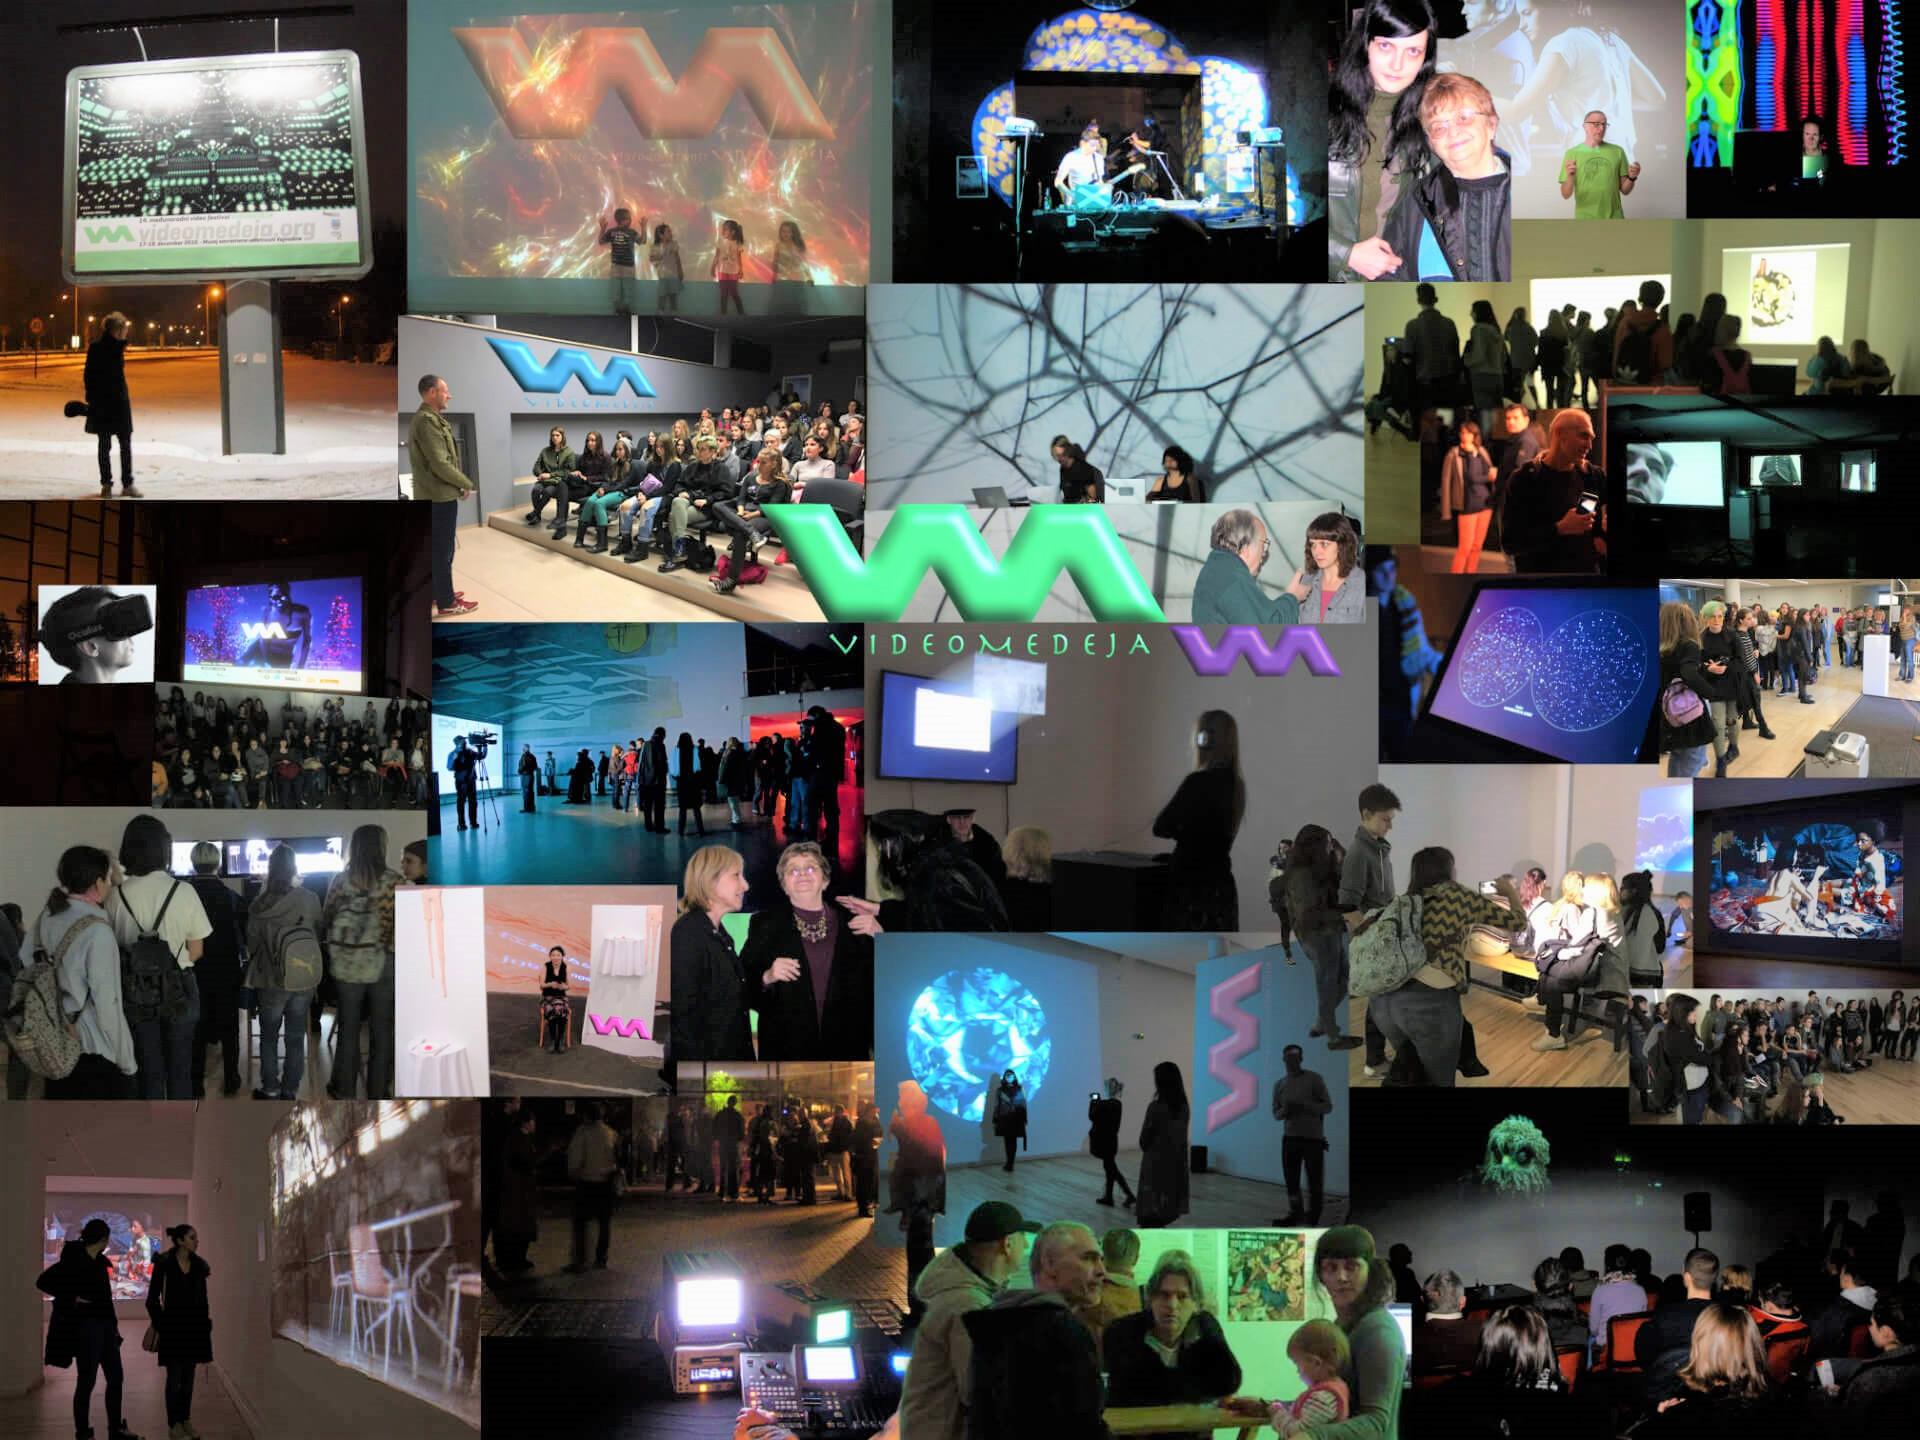 International Art Festival of New Media Novi Sad Serbia